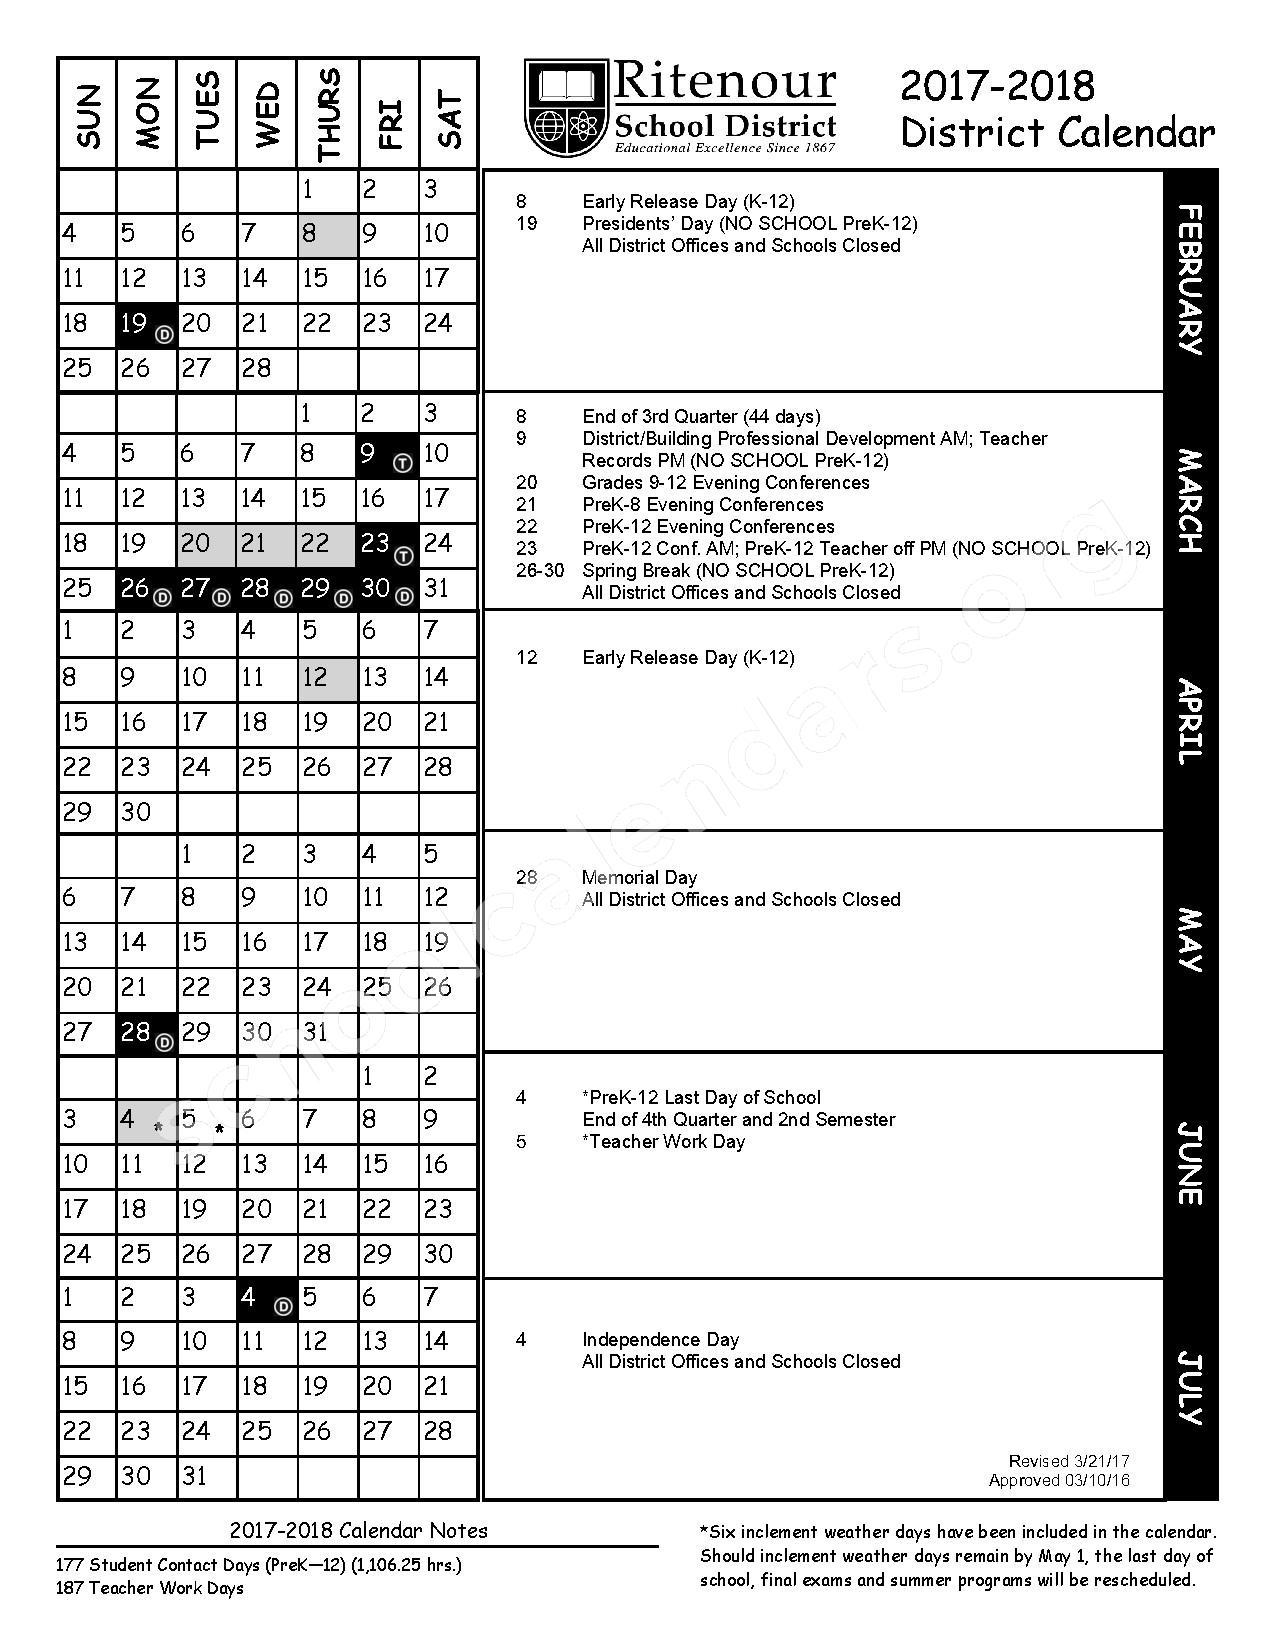 2017 - 2018 District Calendar – Ritenour School District – page 2